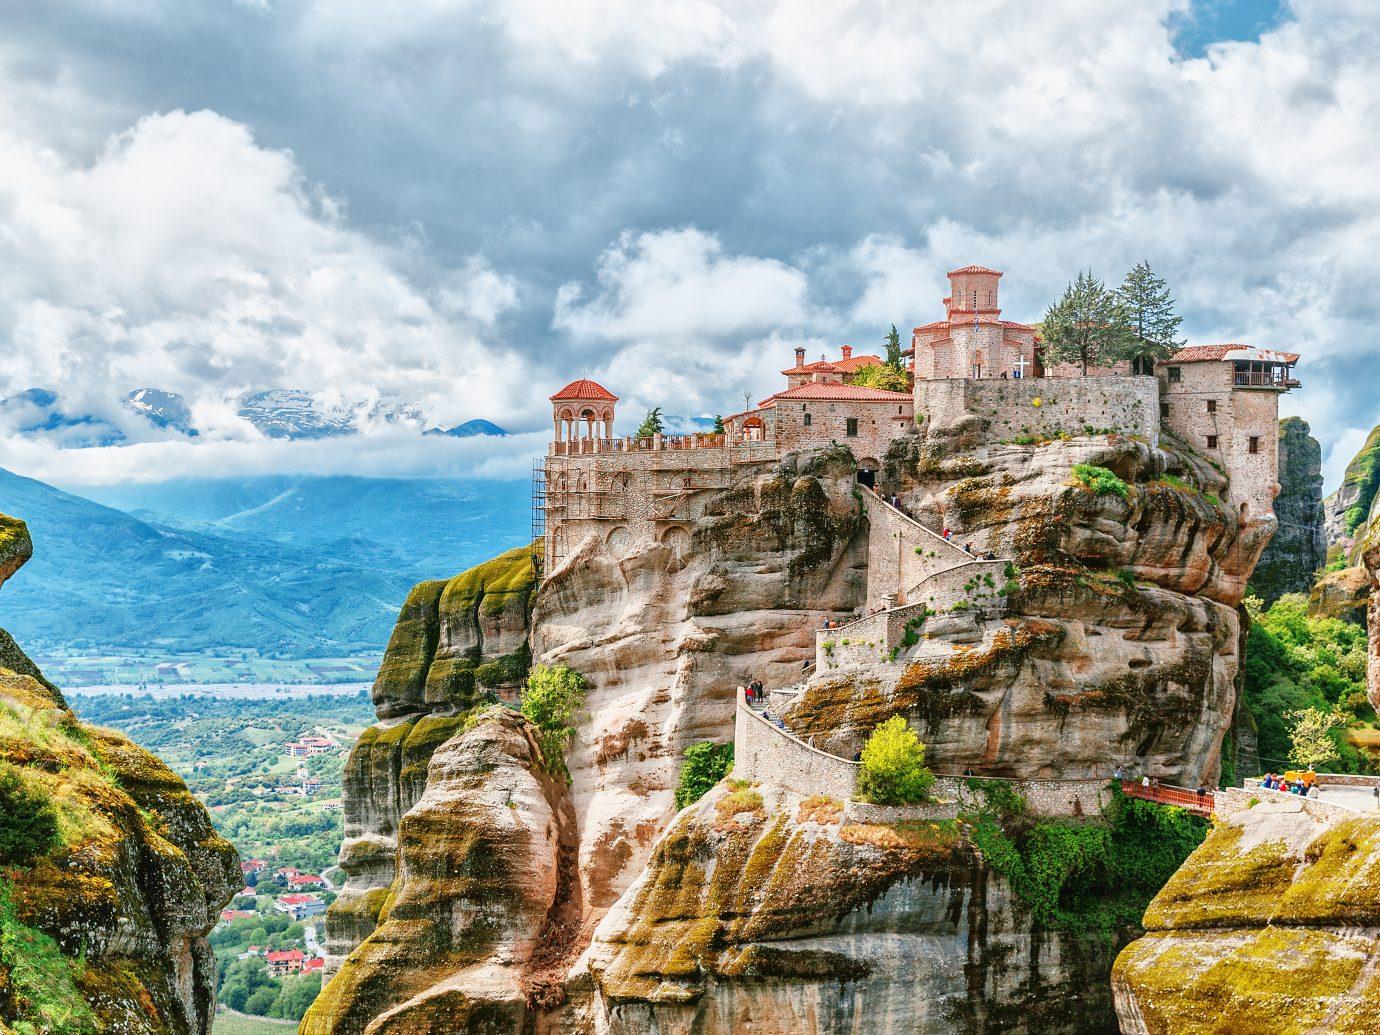 Meteora monastery, Greece. UNESCO heritage list.